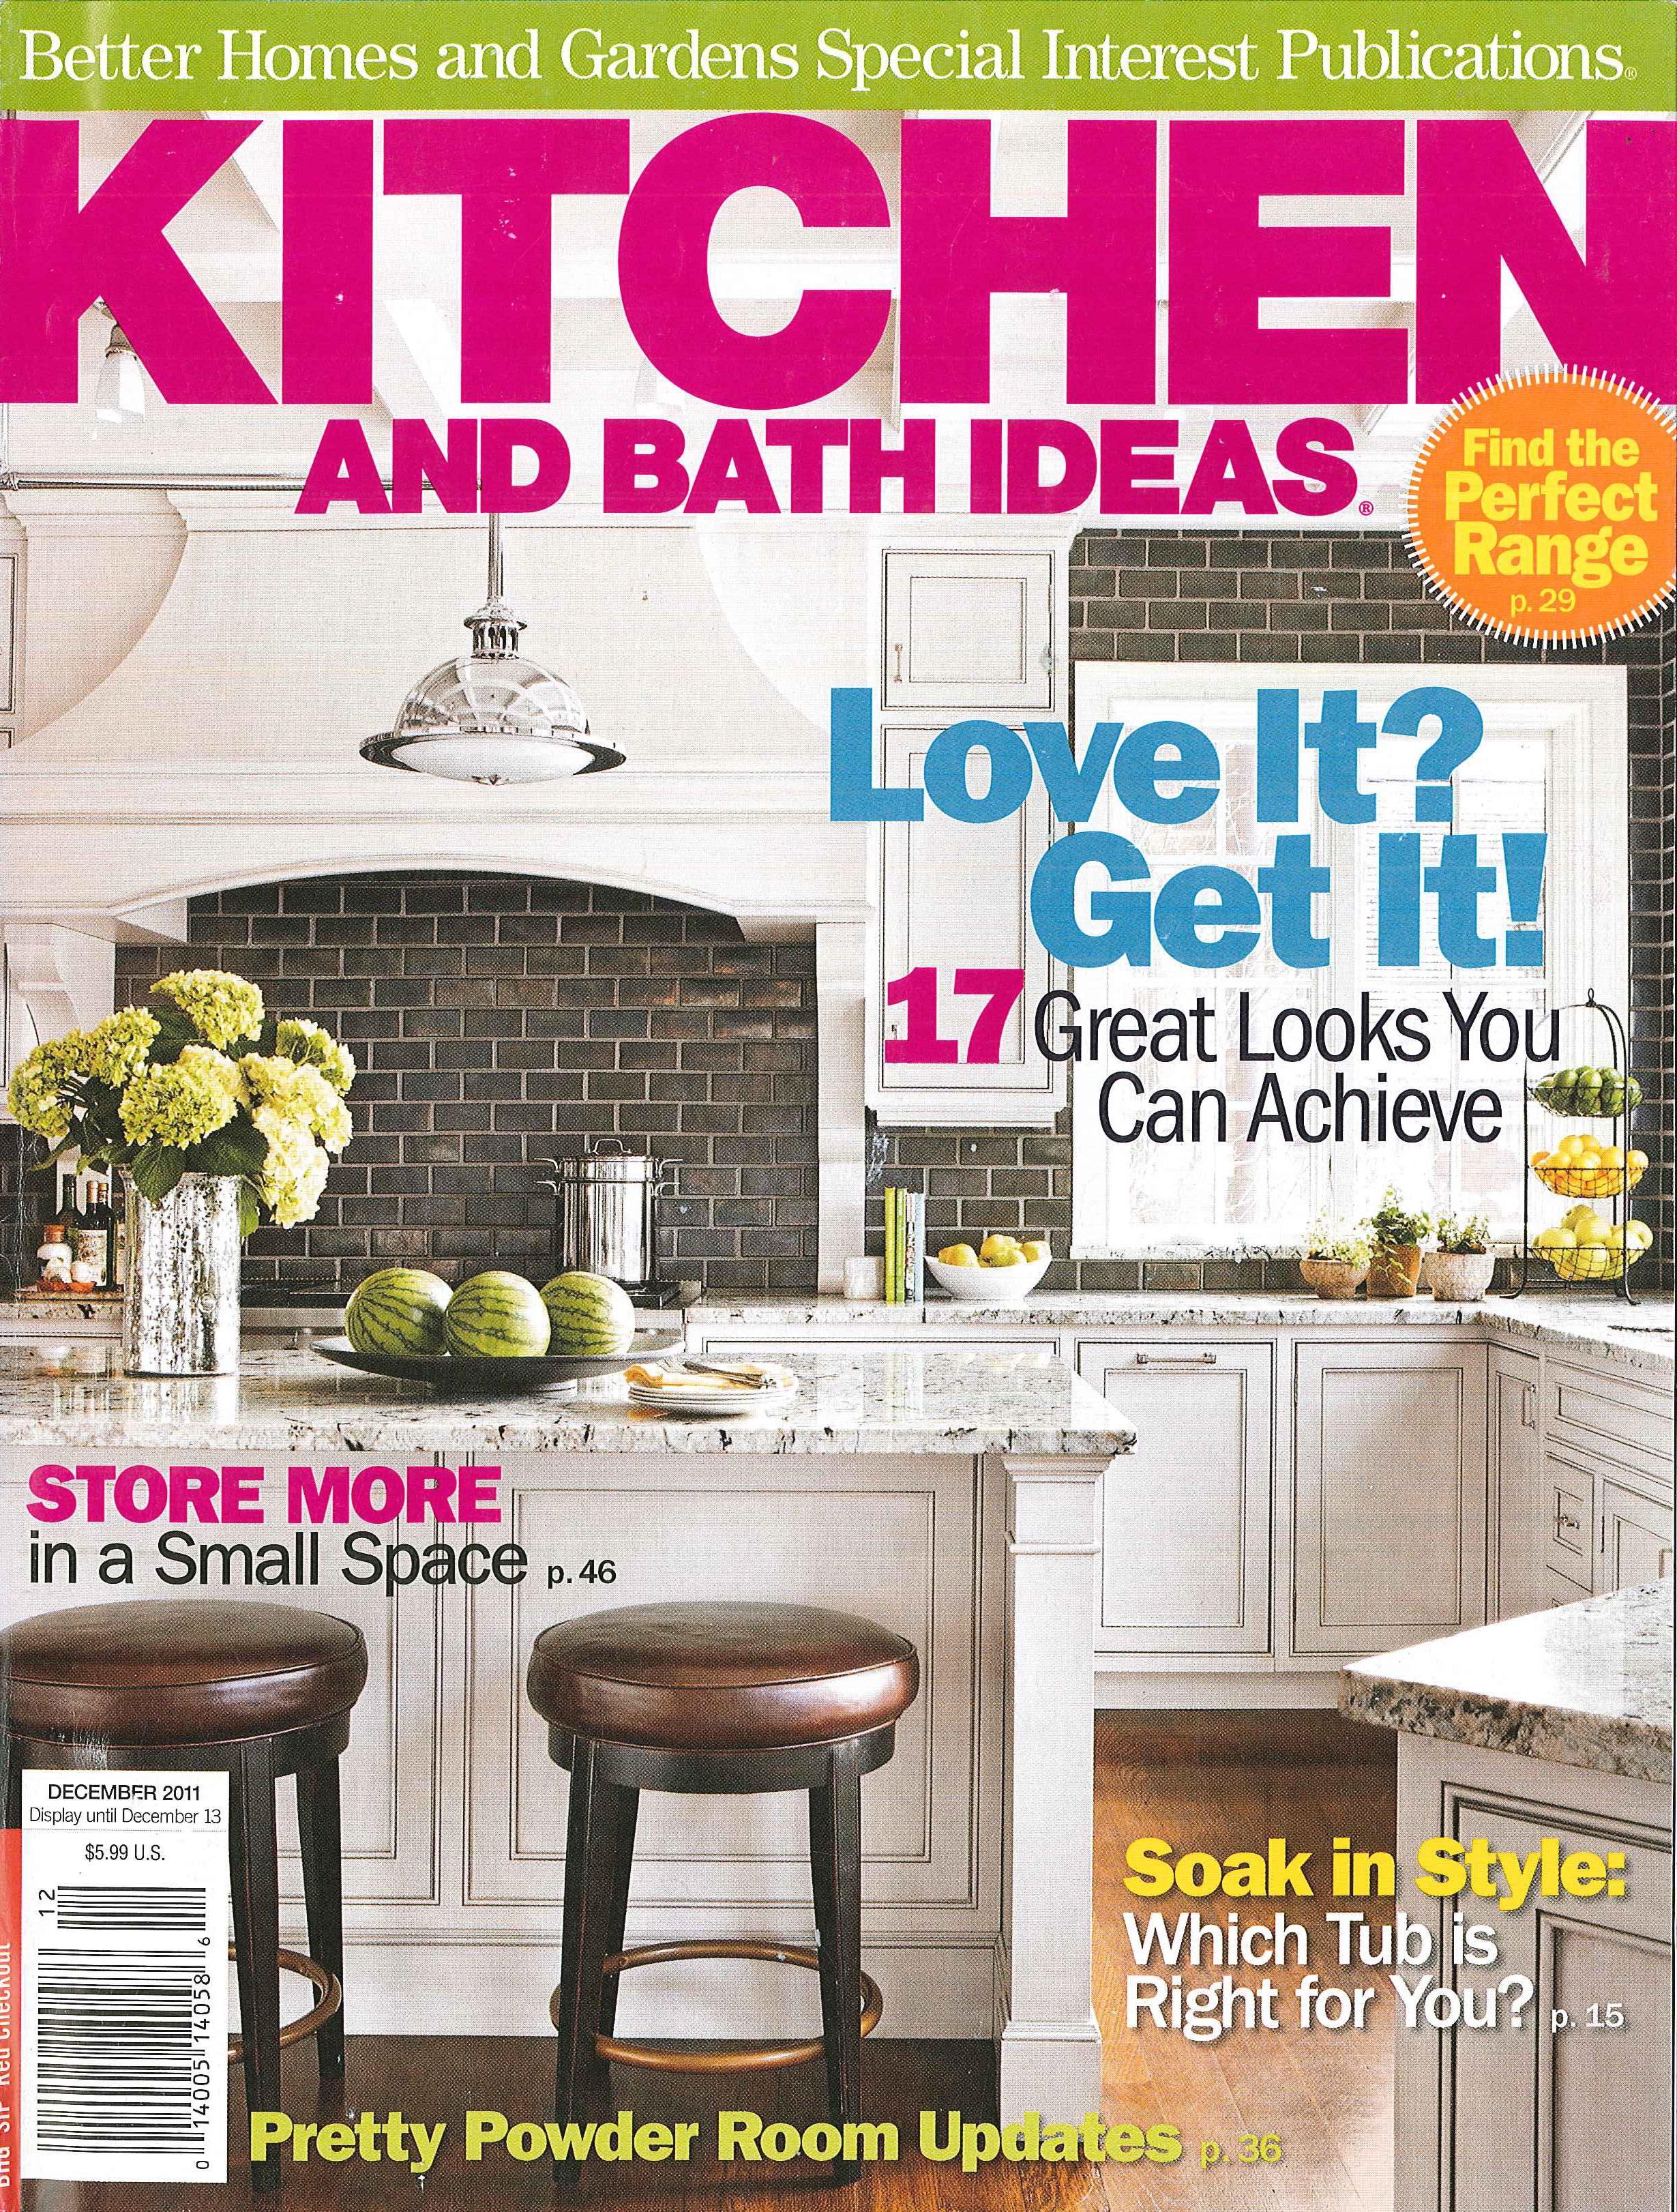 Otis Street Better H&G Kitchen and Bath Ideas Cover.jpg